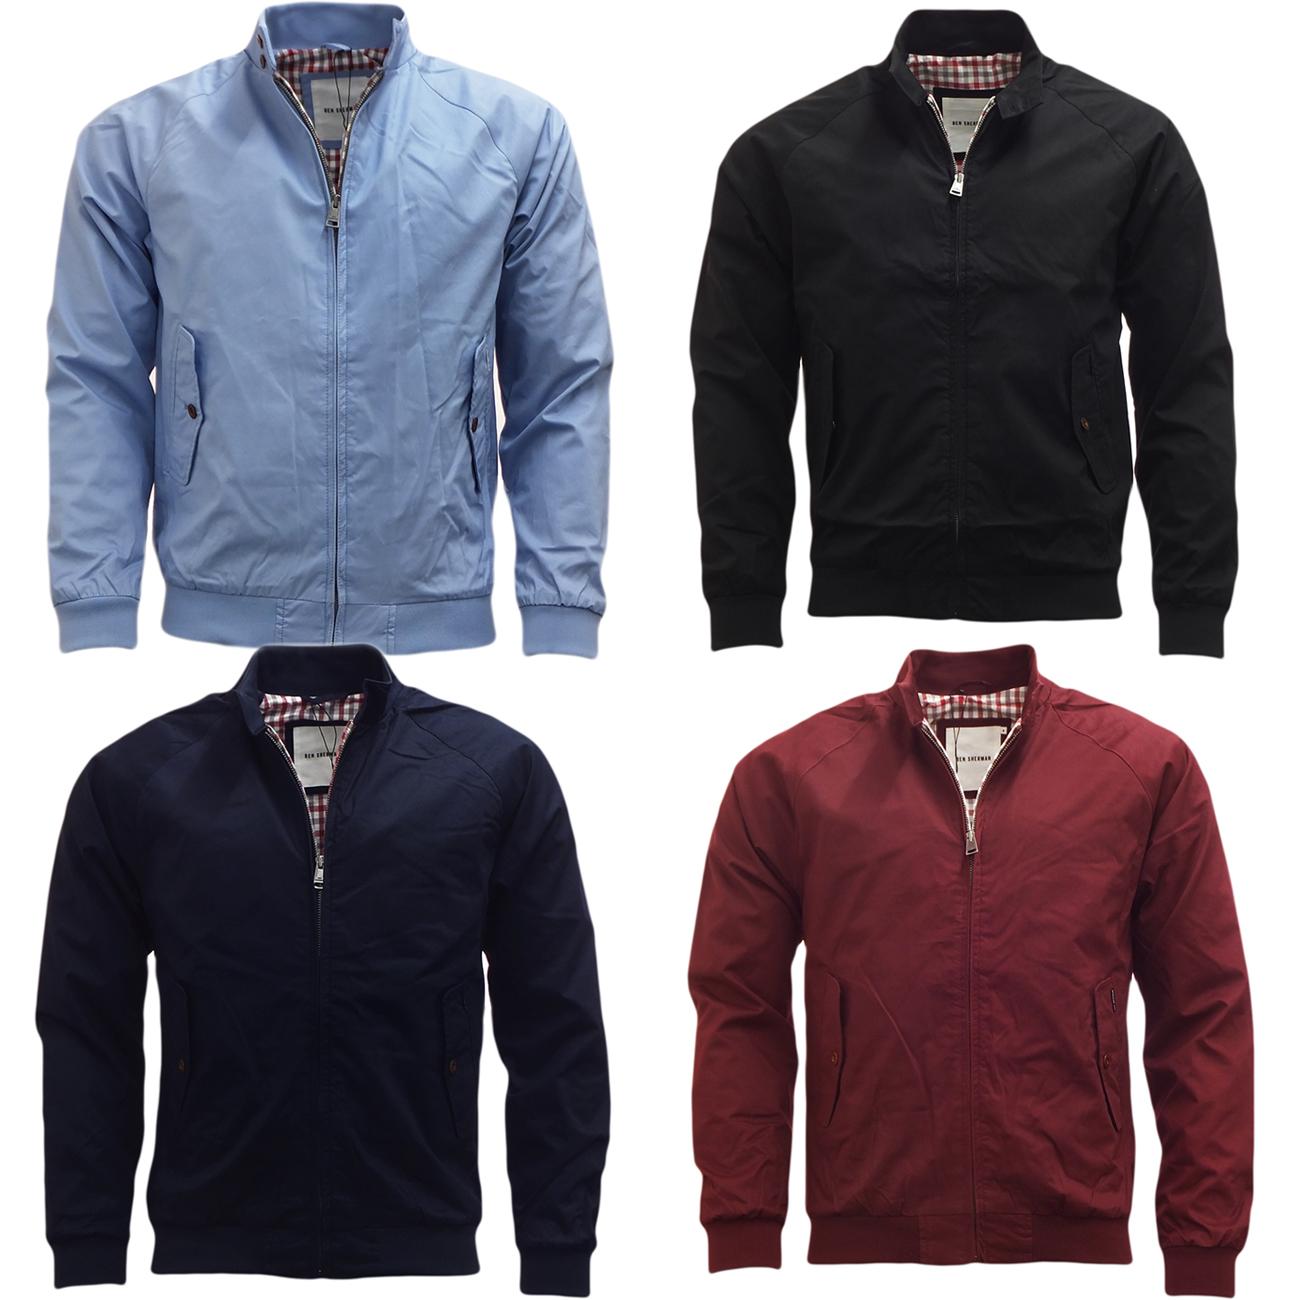 Mens Jacket Ben Sherman Harrington Coat Lightweight Outerwear